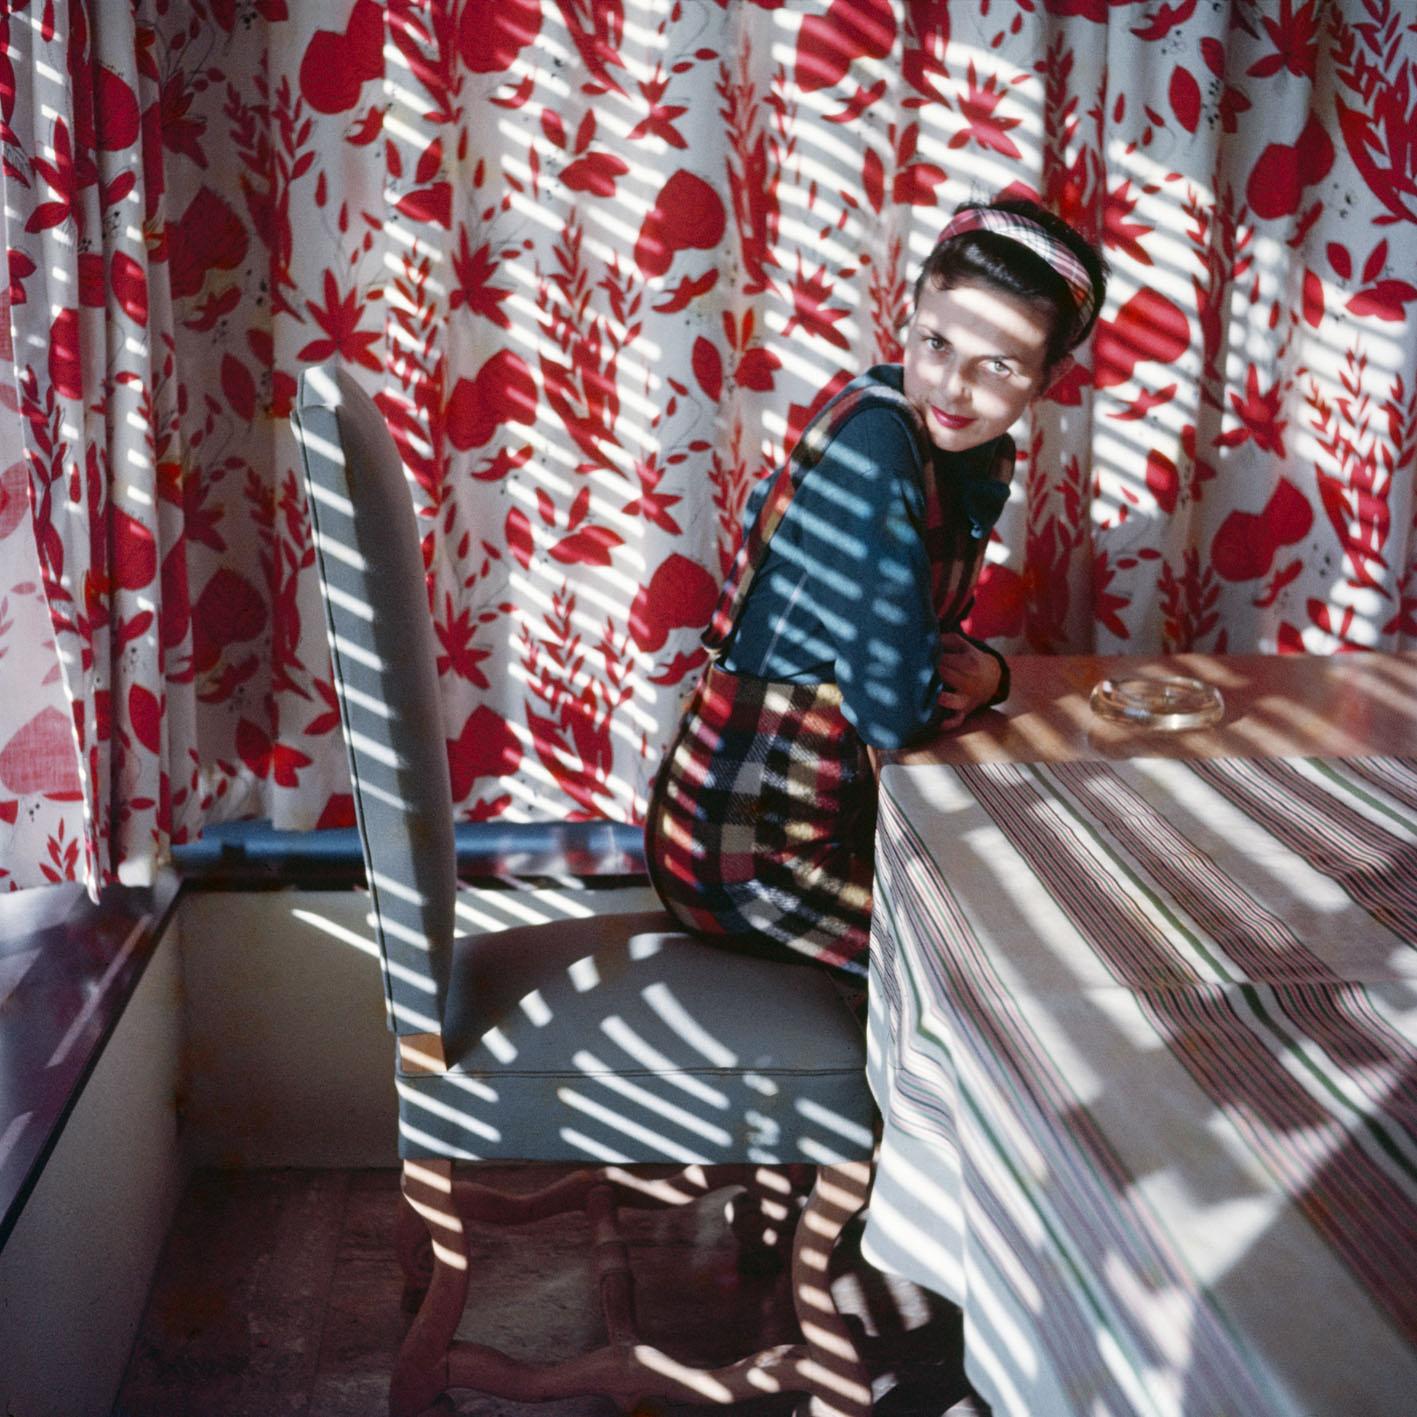 florette_vence_mai1954_photographie_j_h_lartigue_minist_redela_culturefrance_aajhl.jpg